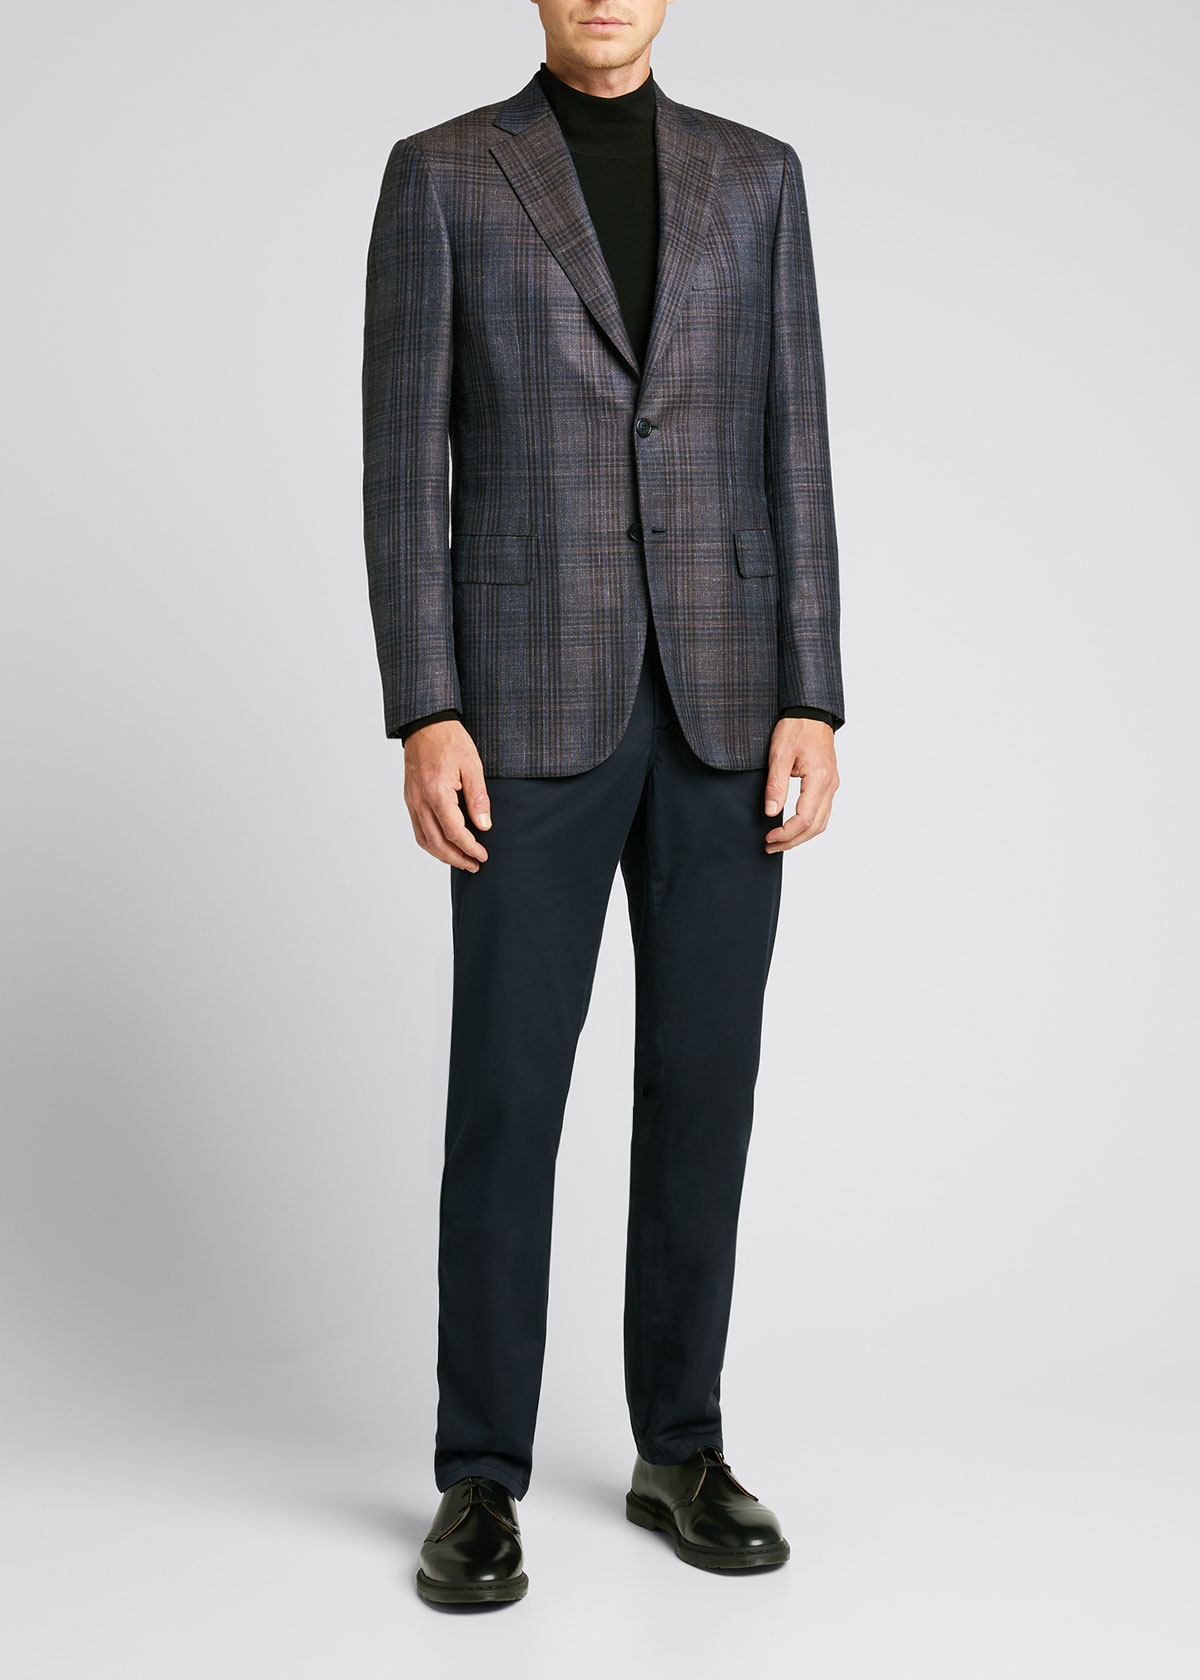 Brioni Men's Glen Plaid Single-breasted Wool, Cashmere & Silk Jacket In Navy